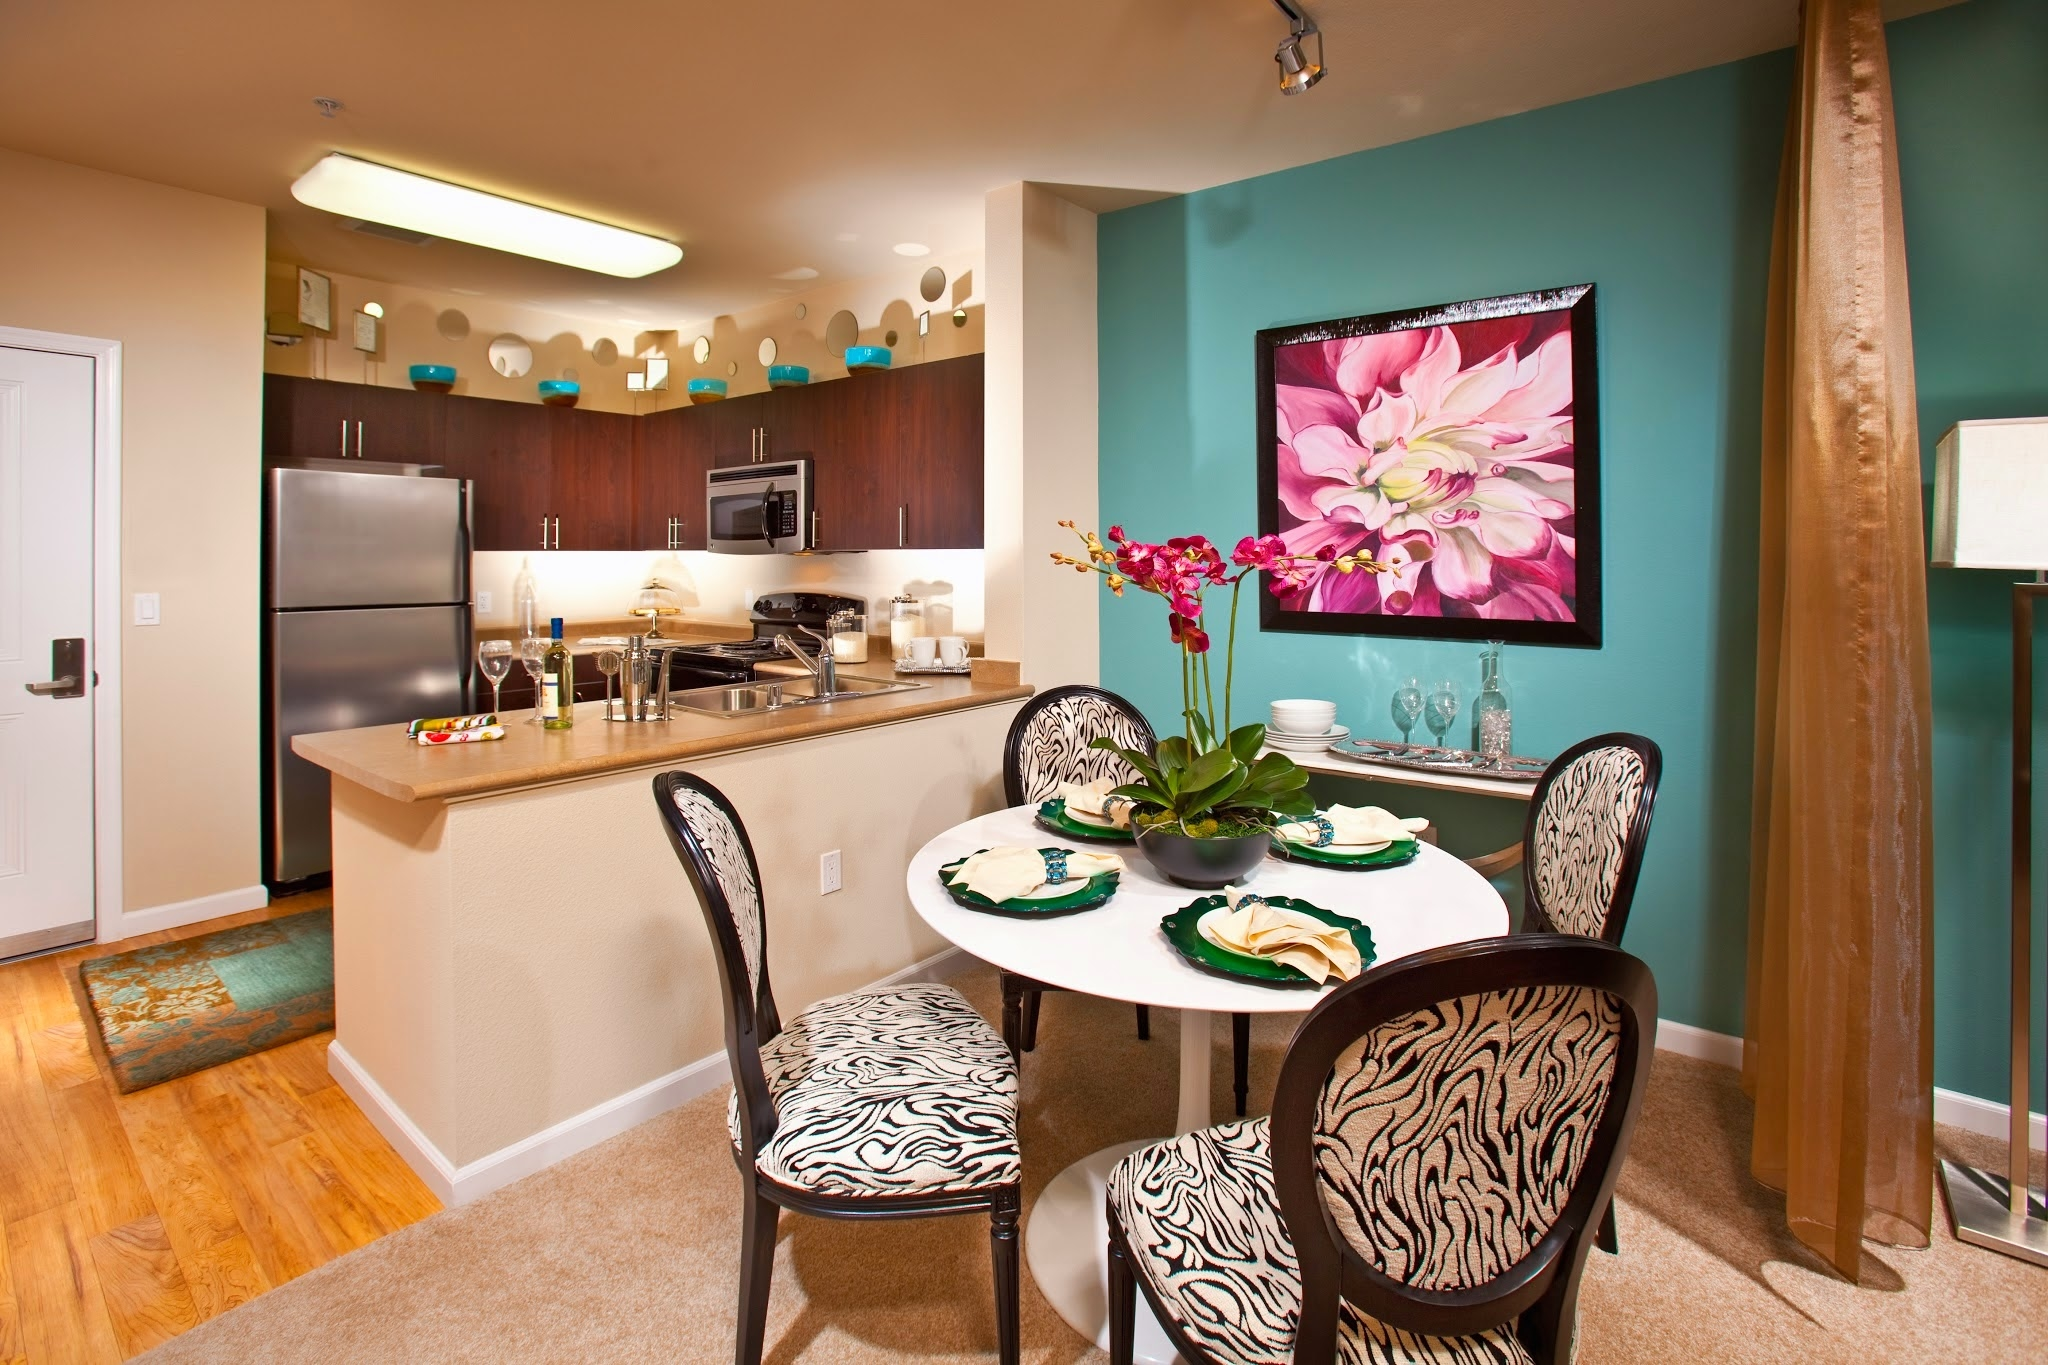 Alterra at Grossmont Trolley Apartments in La Mesa CA 619 675